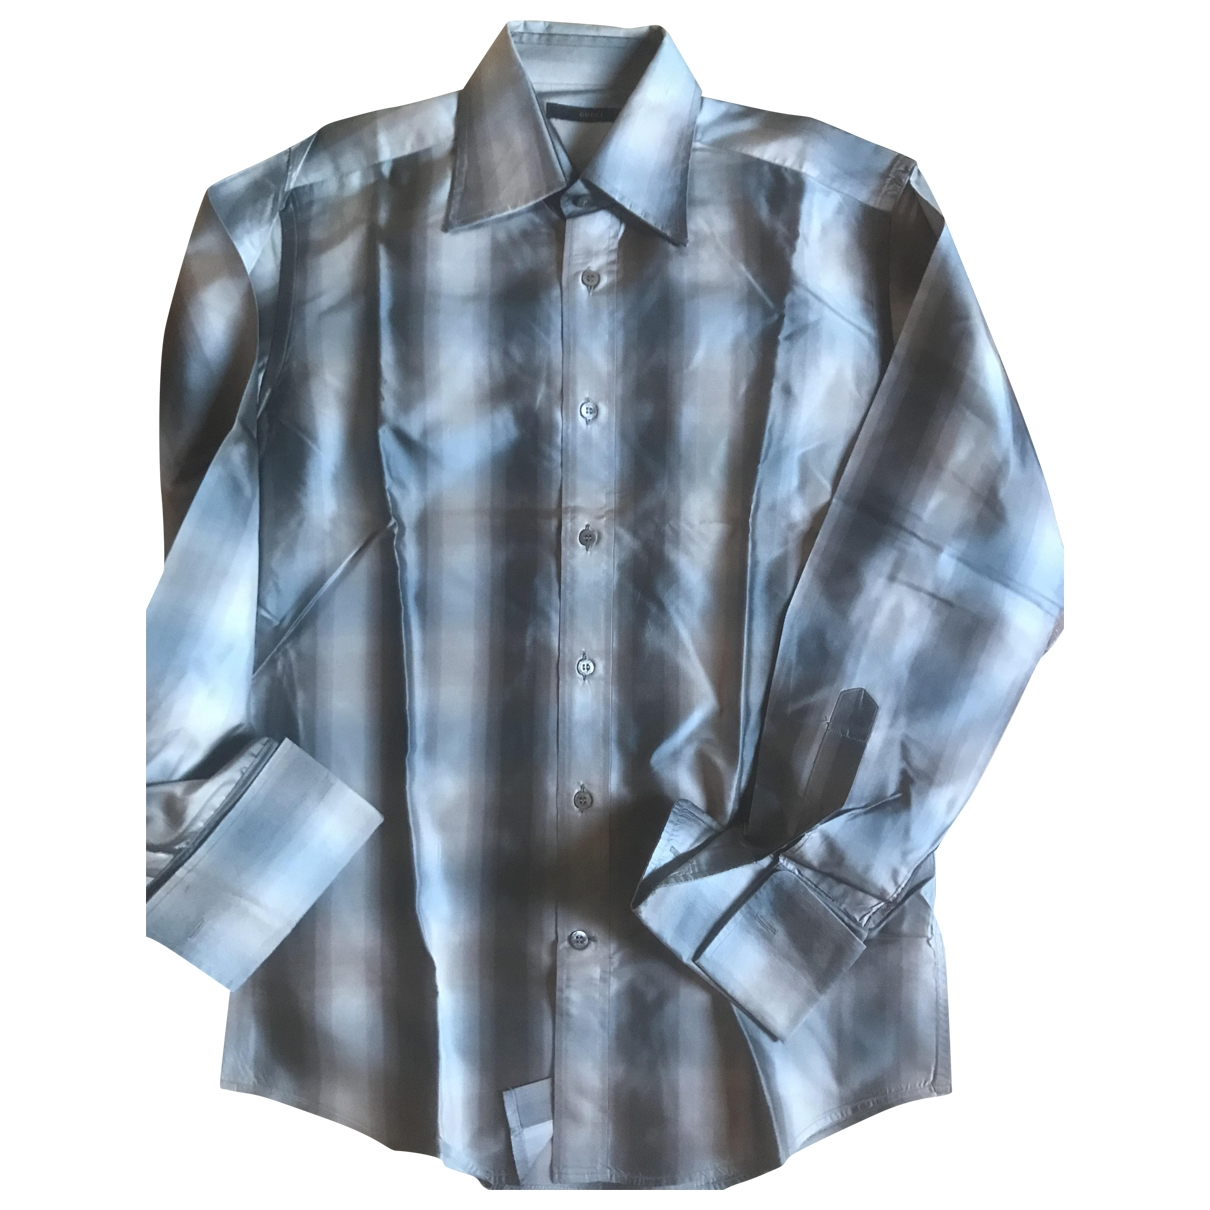 Gucci \N Silver Silk Shirts for Men 37 EU (tour de cou / collar)